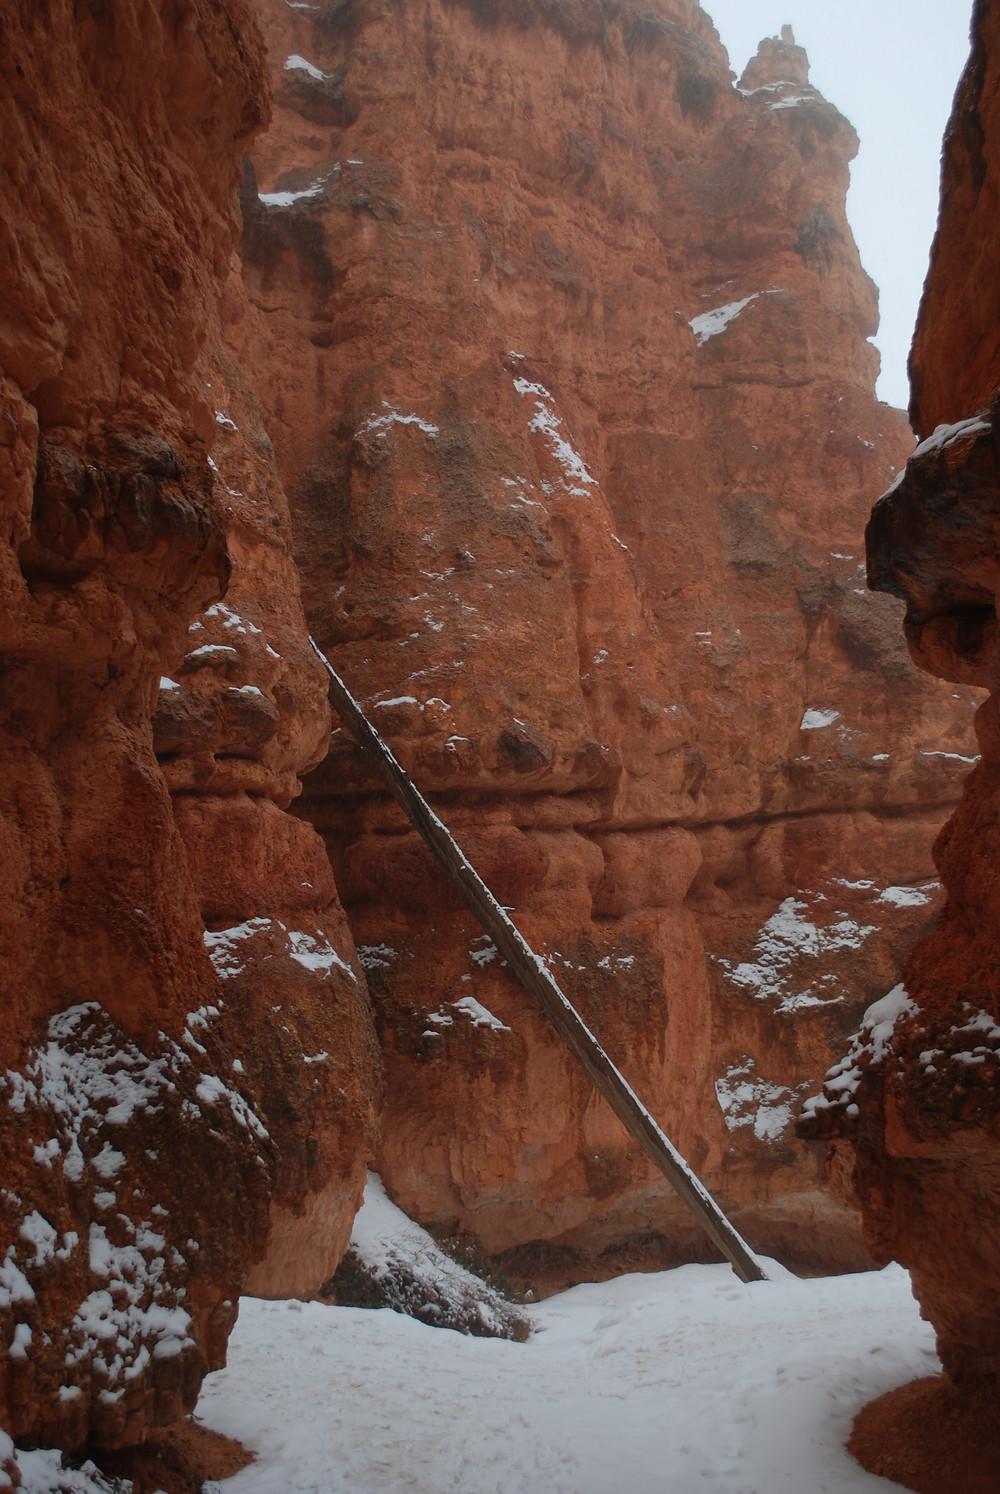 snowy trail among tall orange cliffs